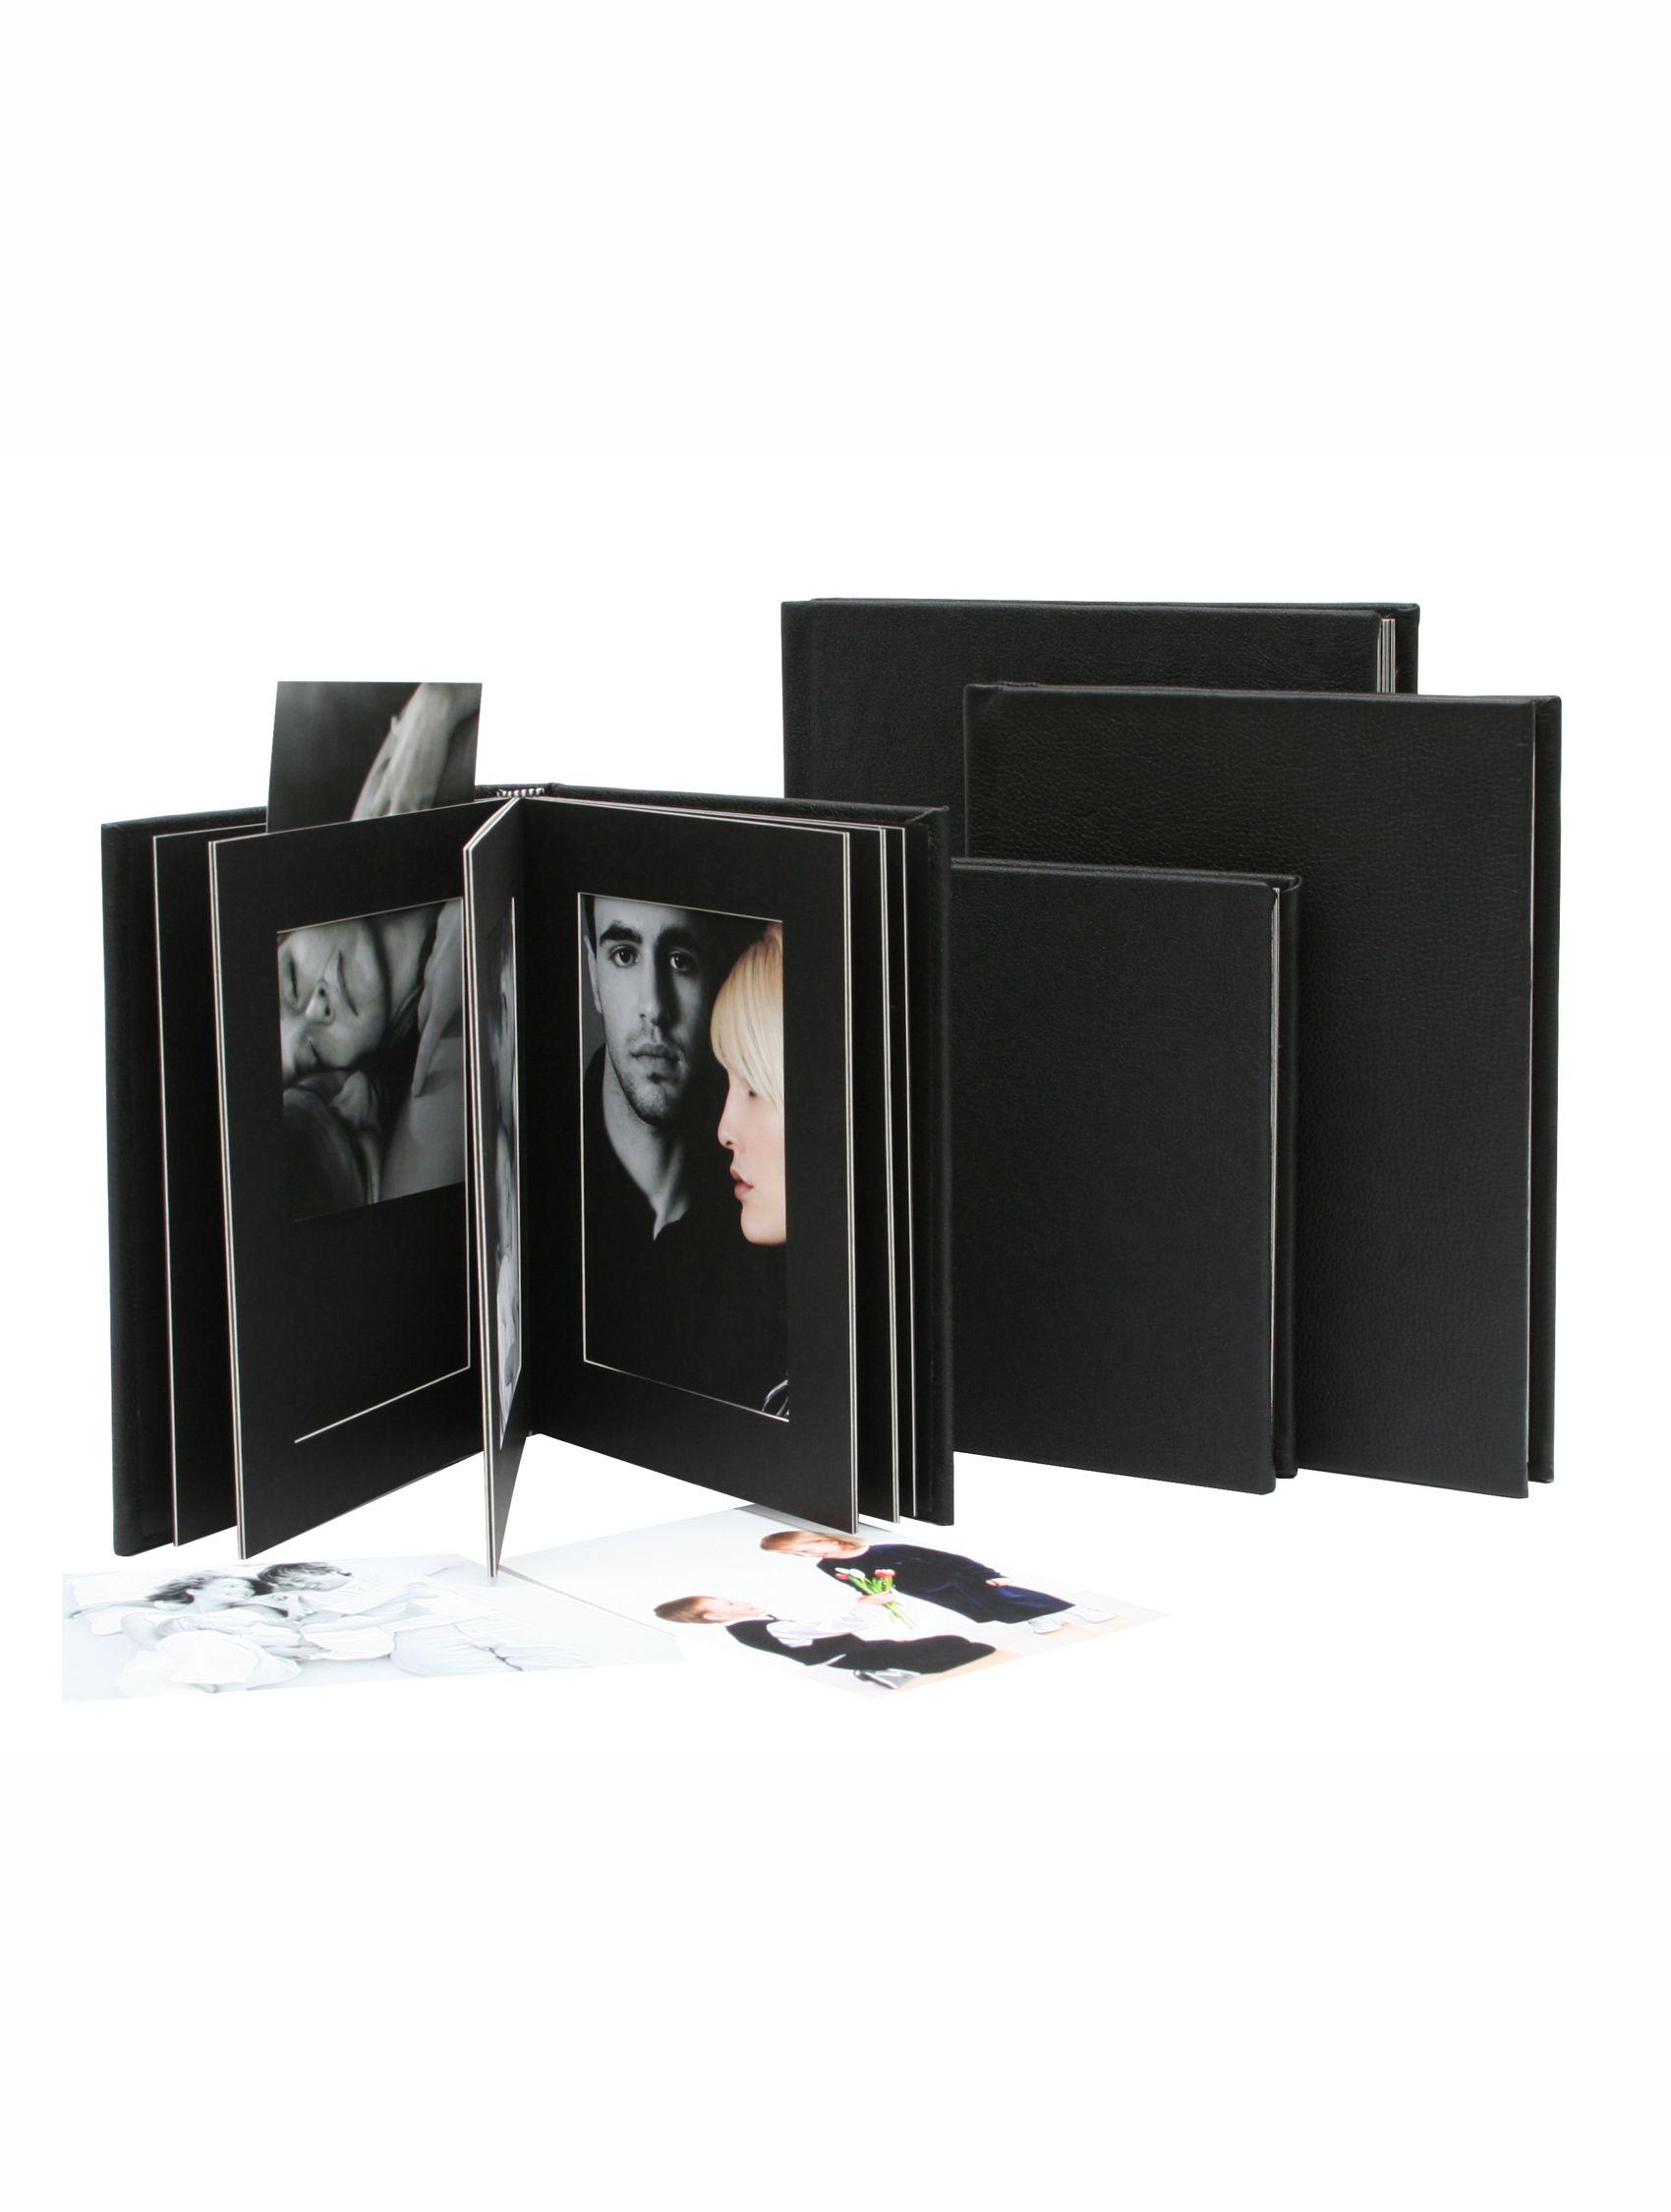 passepartout album, zwart leder, 10 foto's A66DA2 10PH